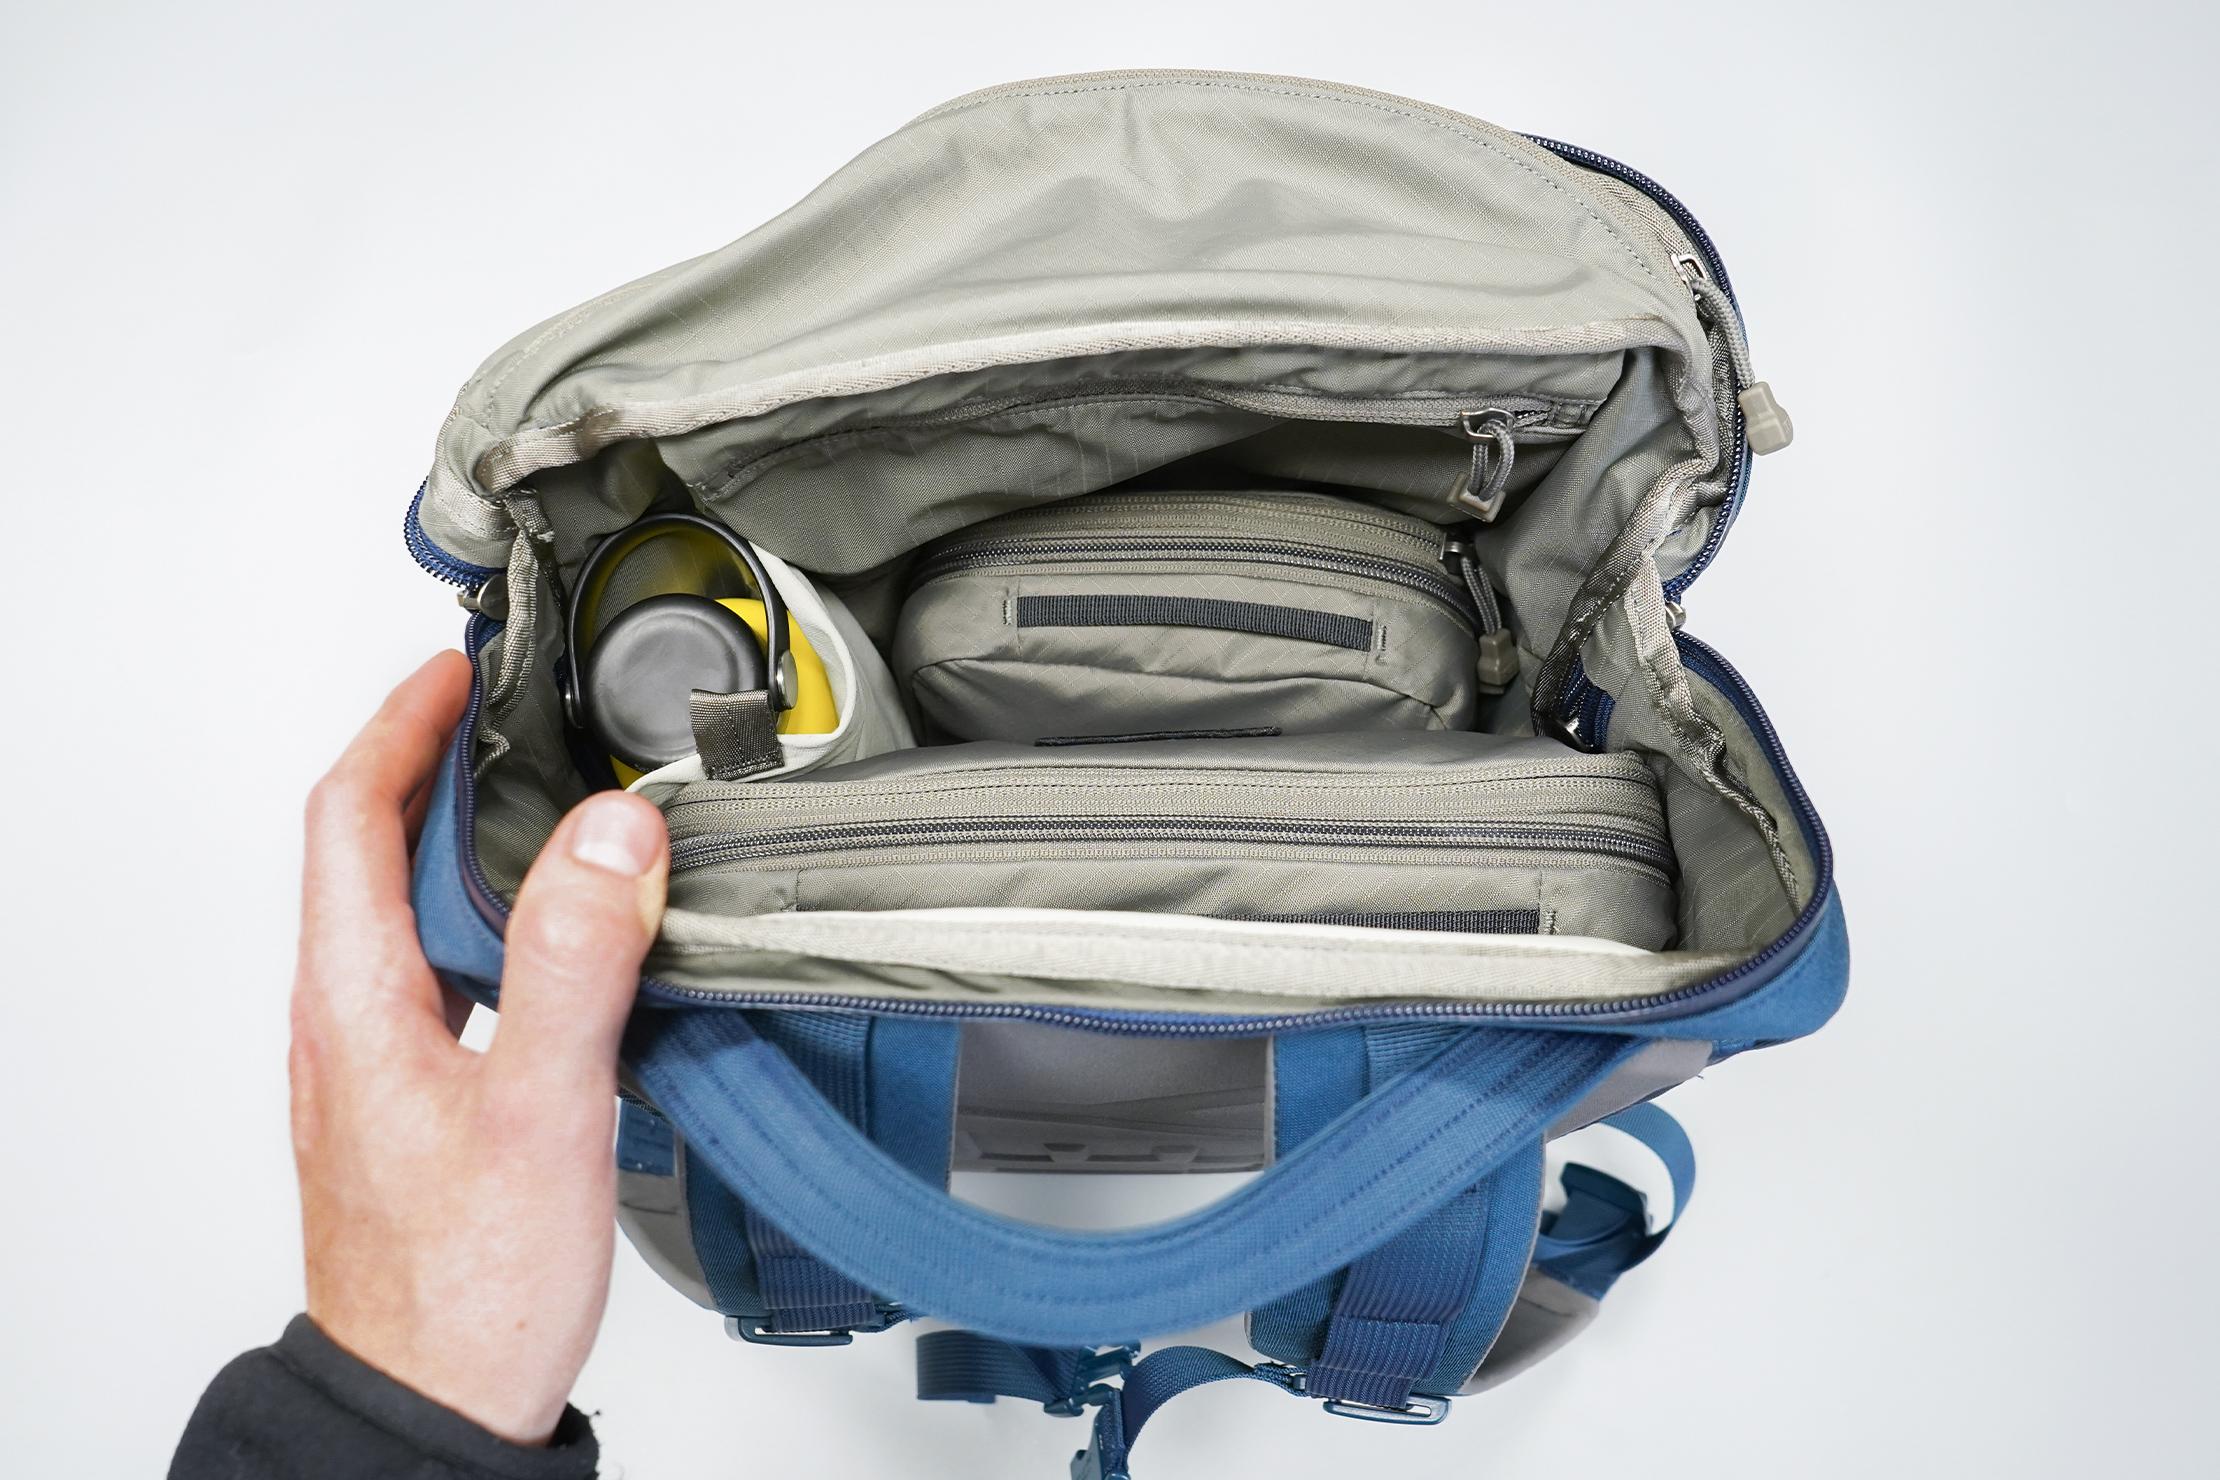 YETI Crossroads 22L Backpack | Main Compartment